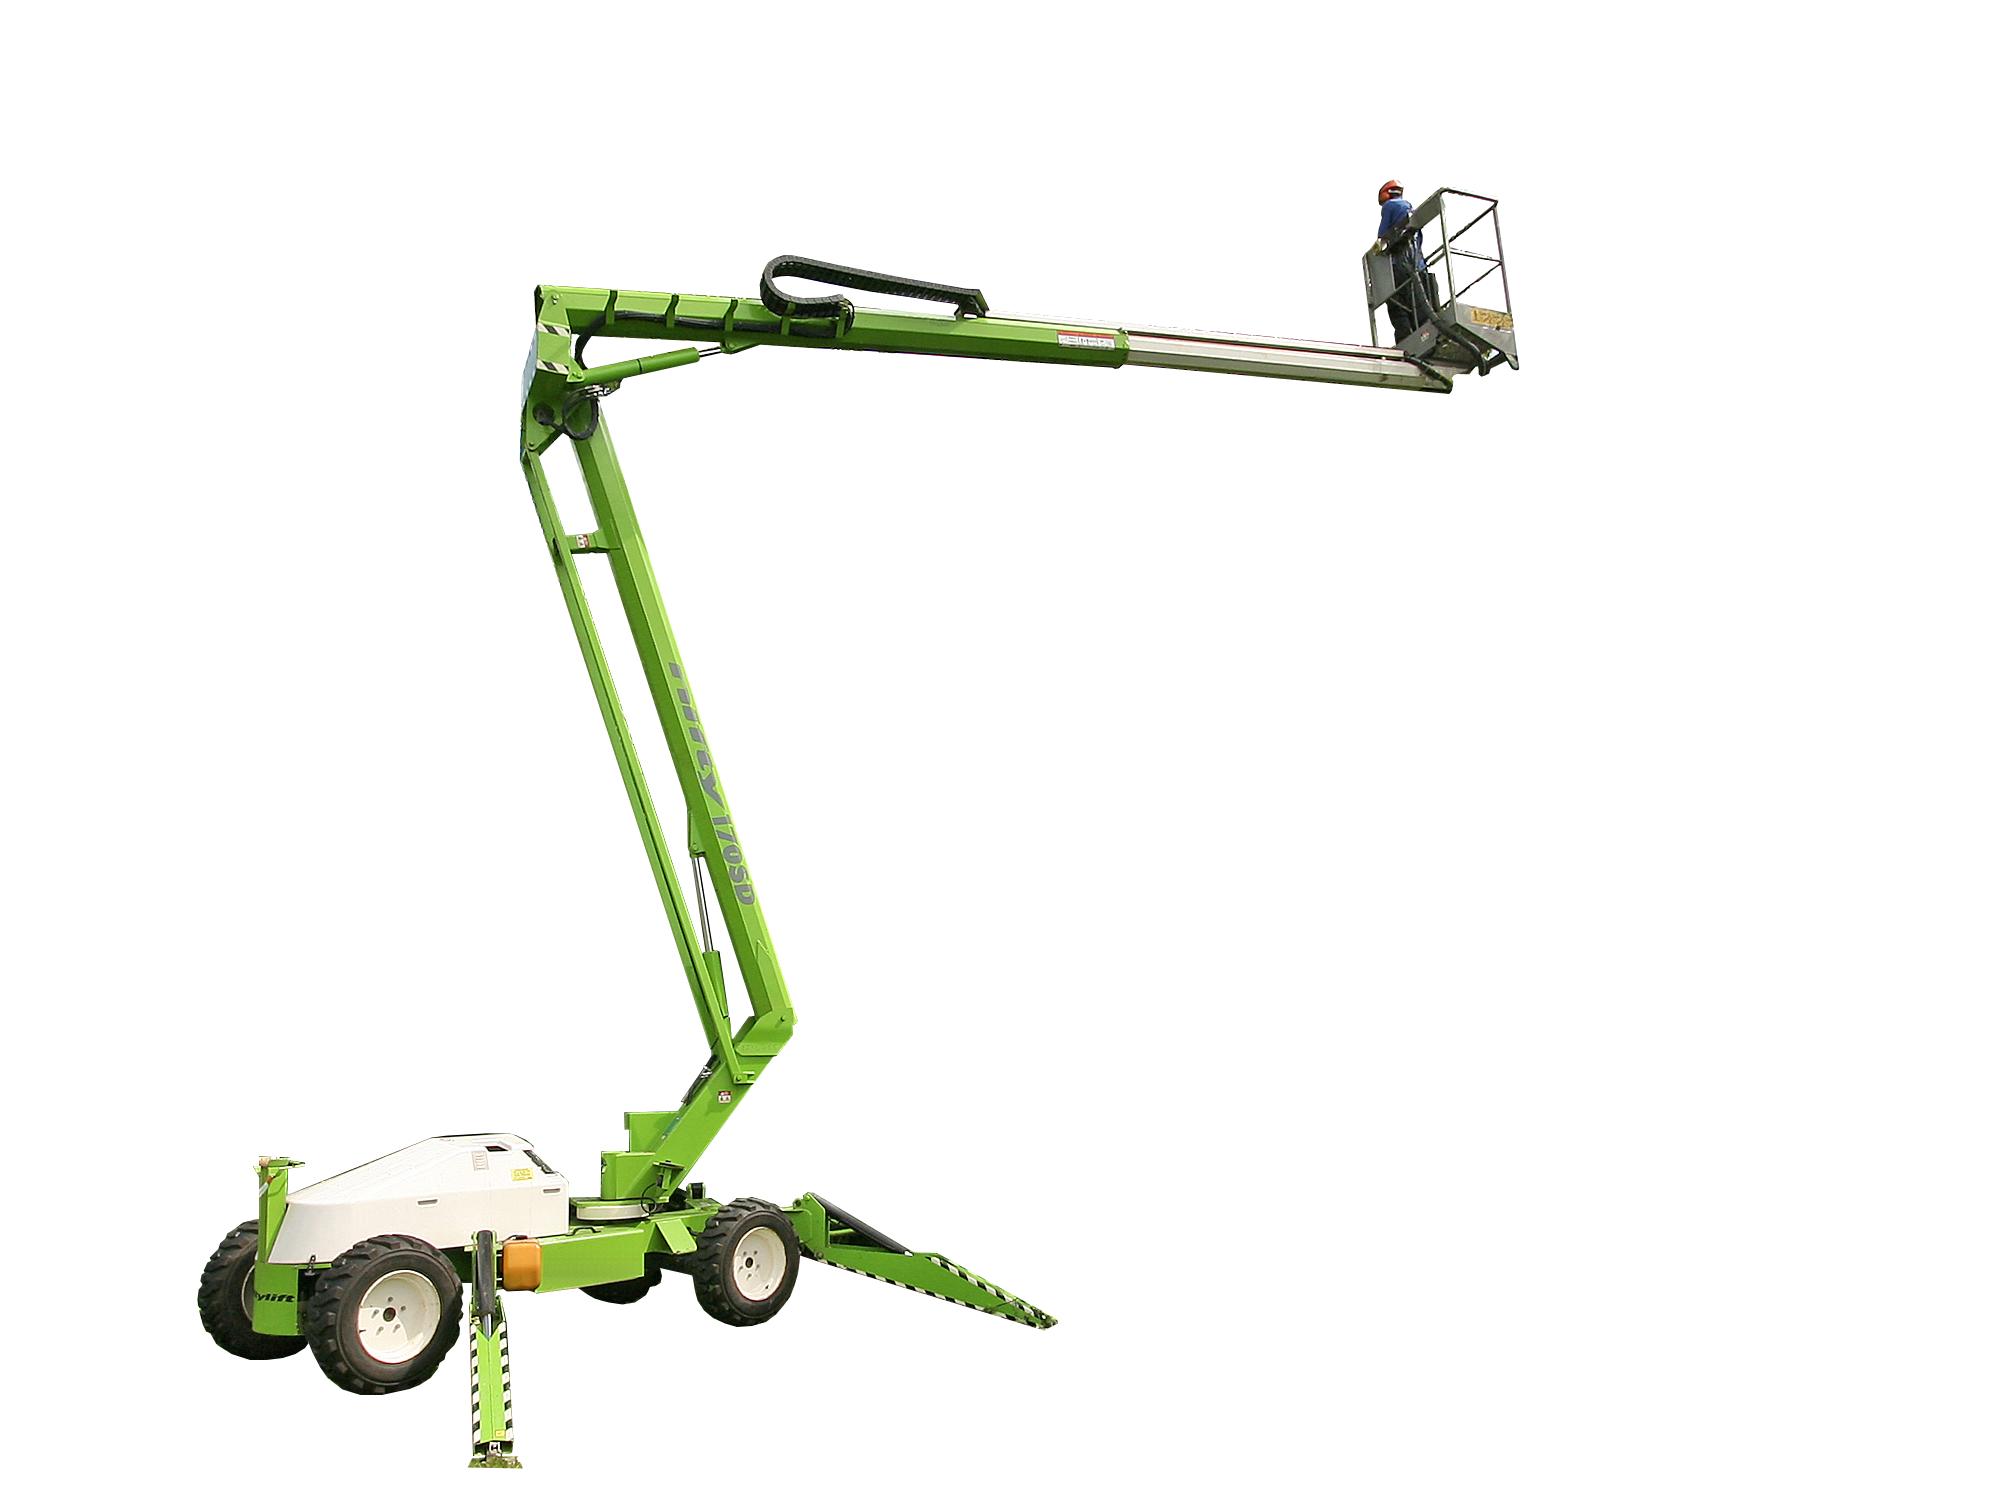 Niftylift SD170 machine image